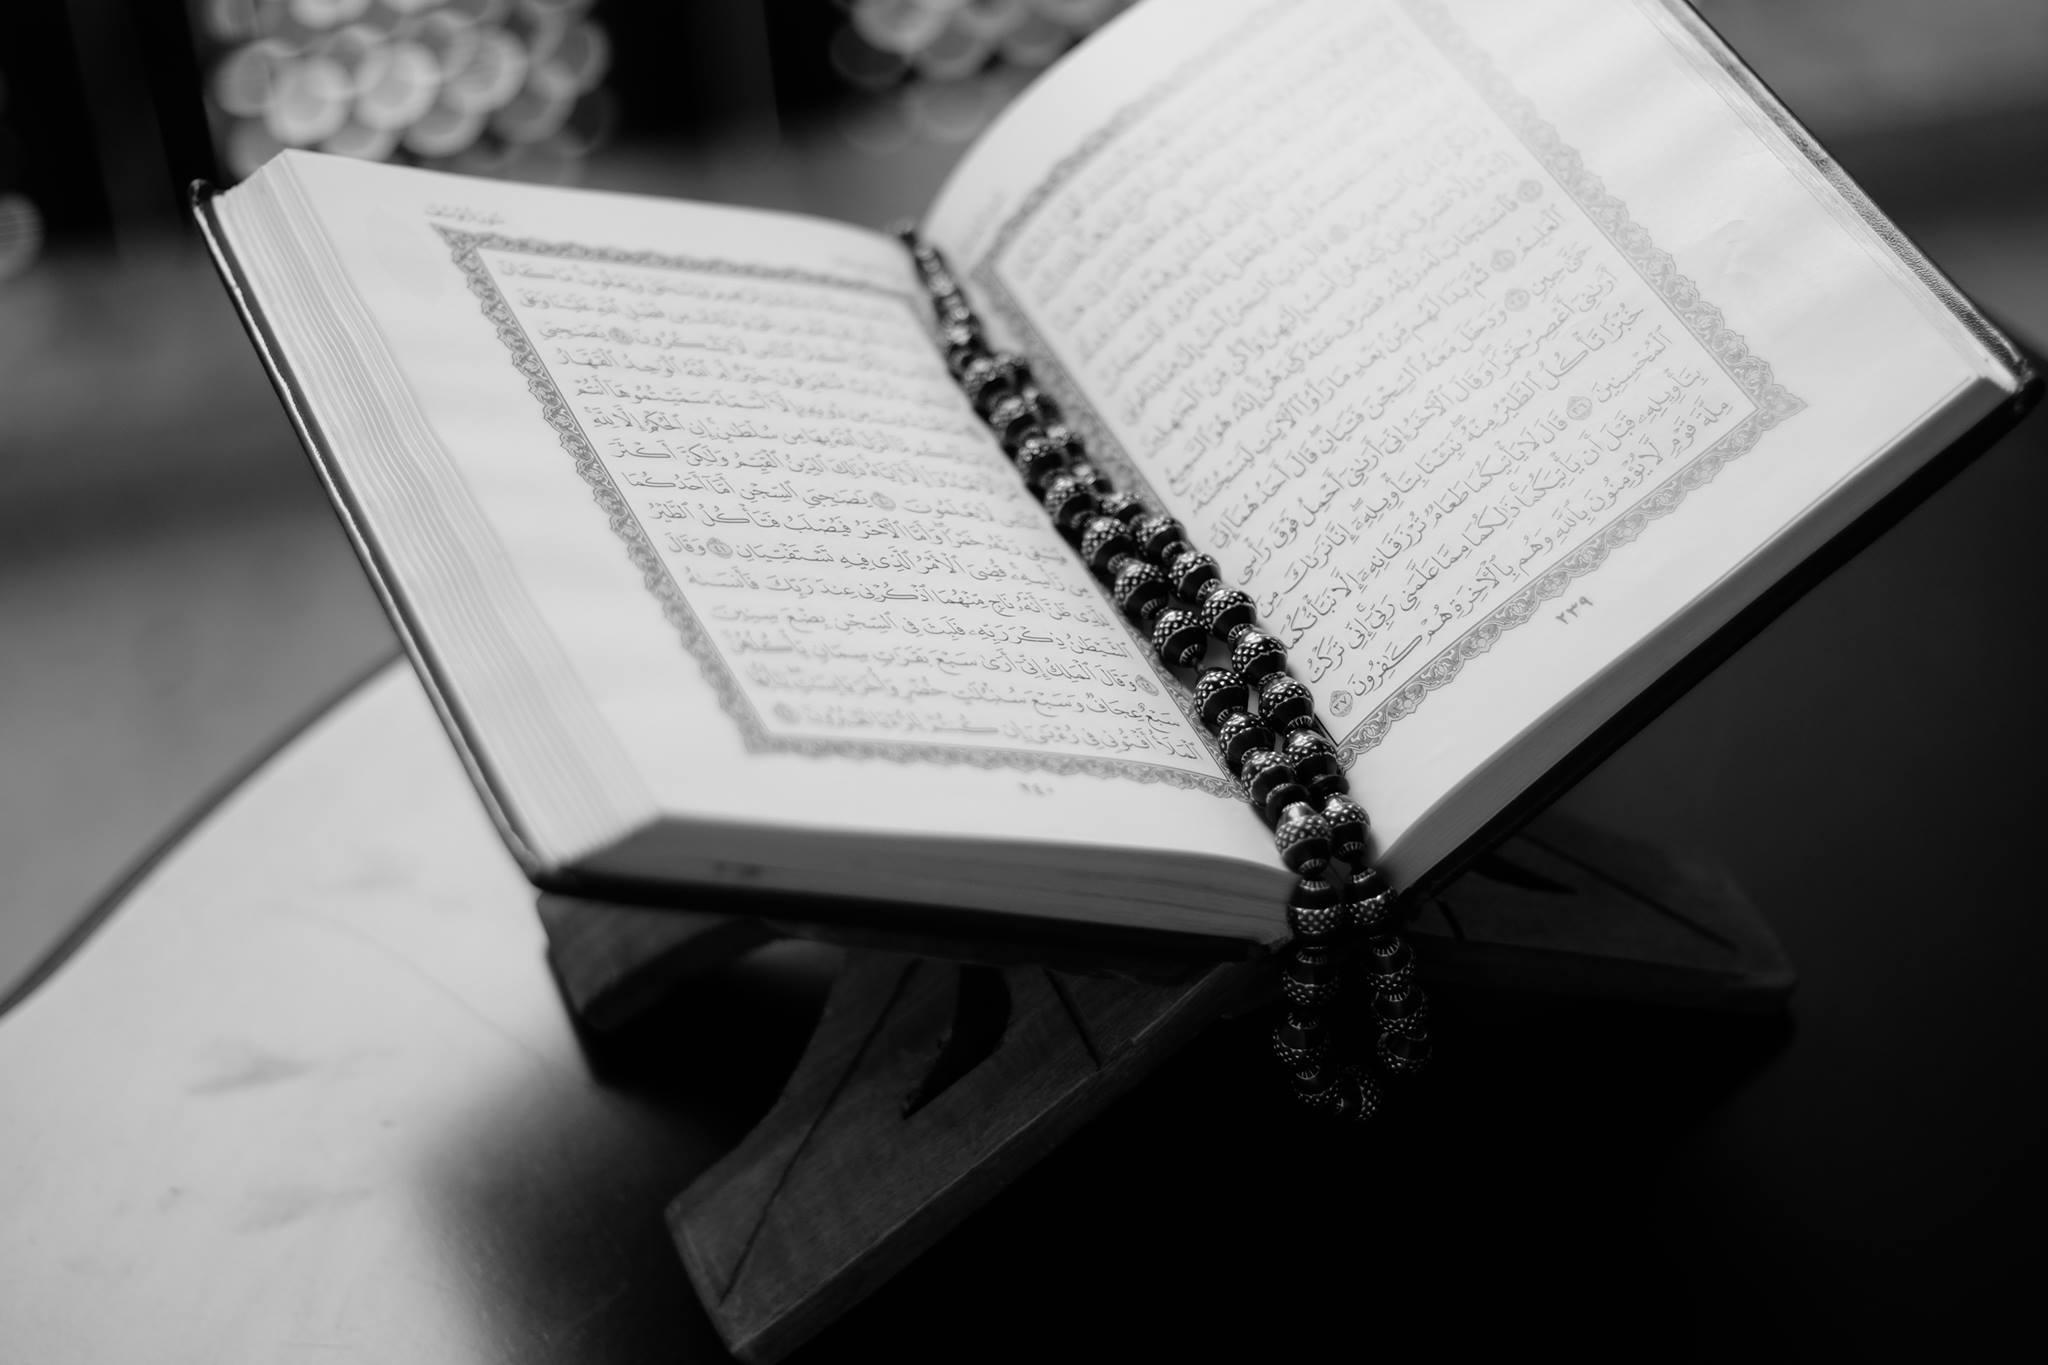 koran-bild